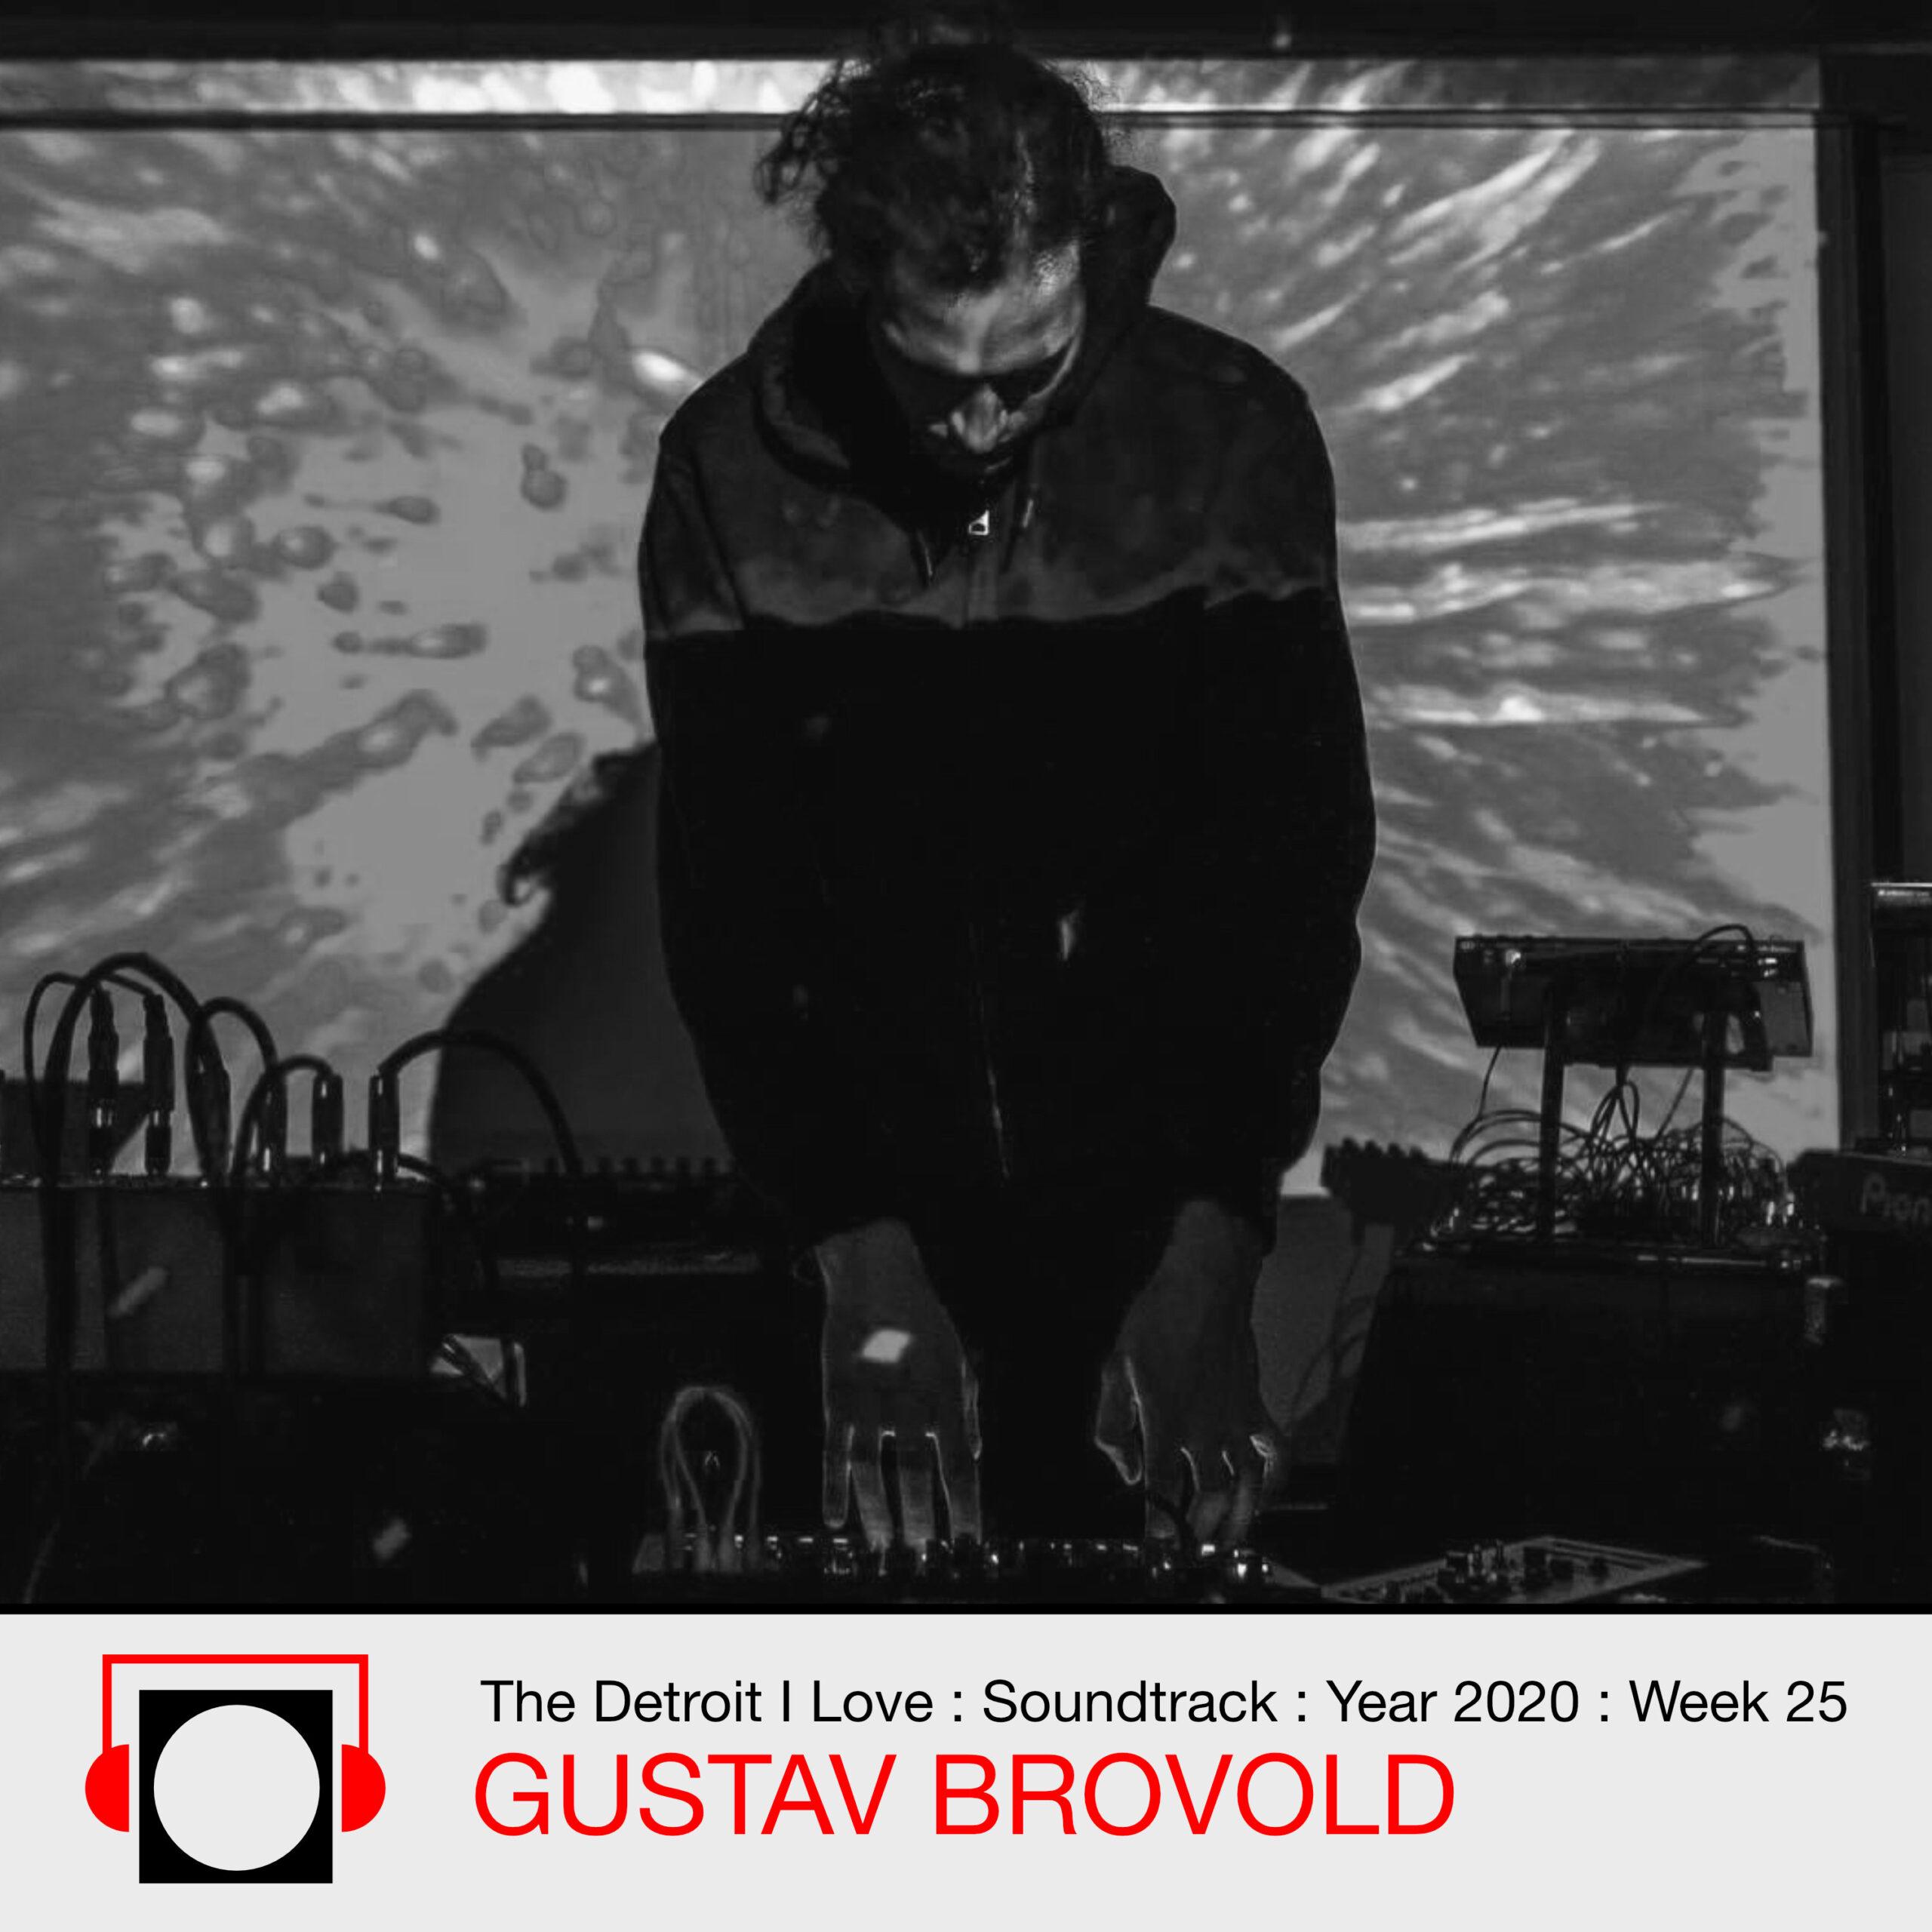 Soundtrack : Gustav Brovold